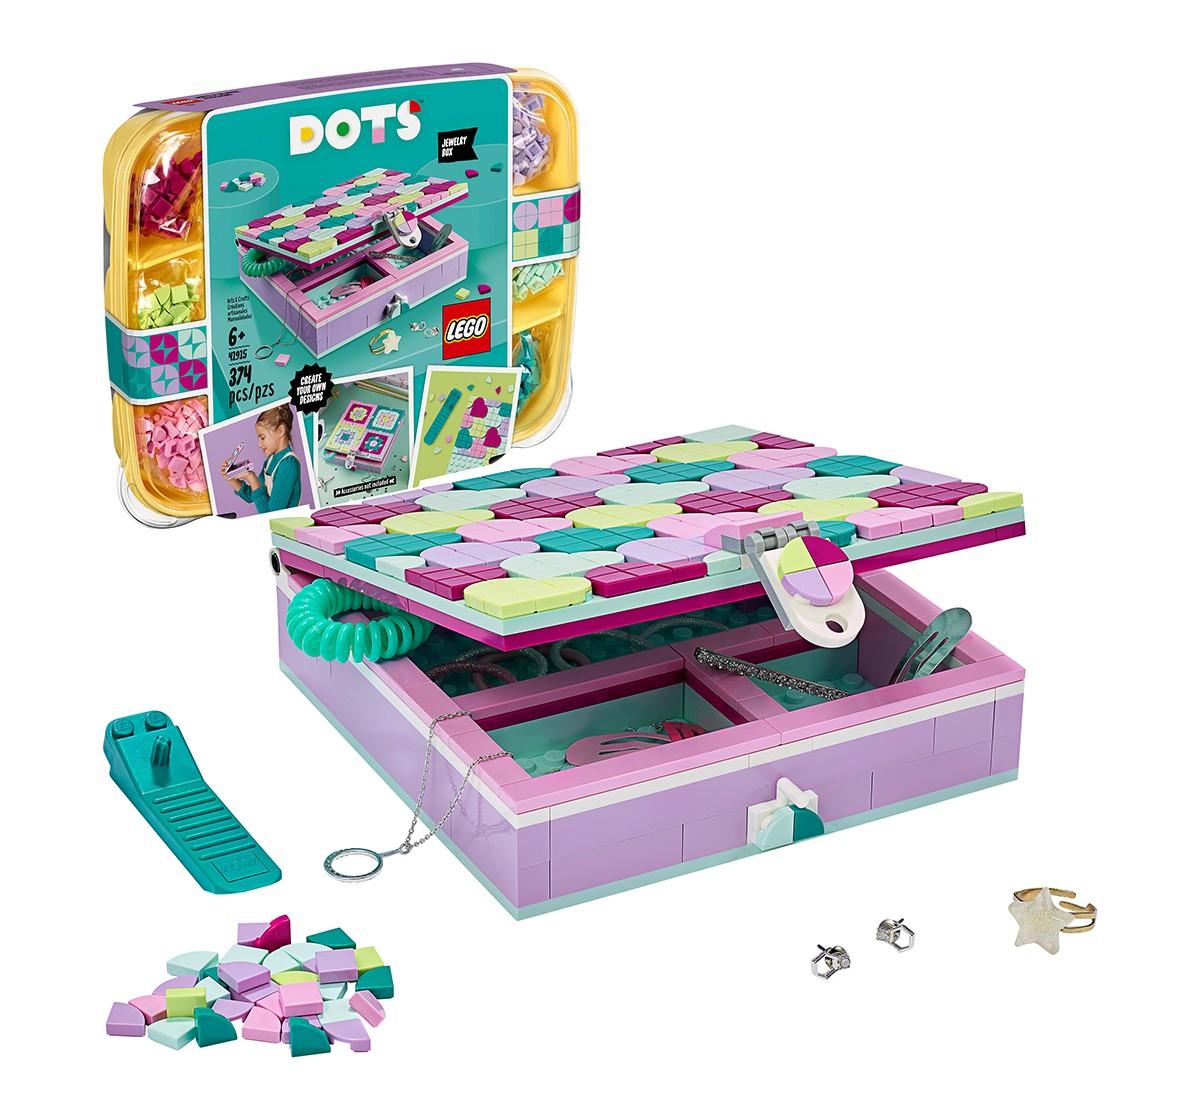 LEGO DOTS Jewelry Box 41915 Lego Blocks for Girls age 6Y+